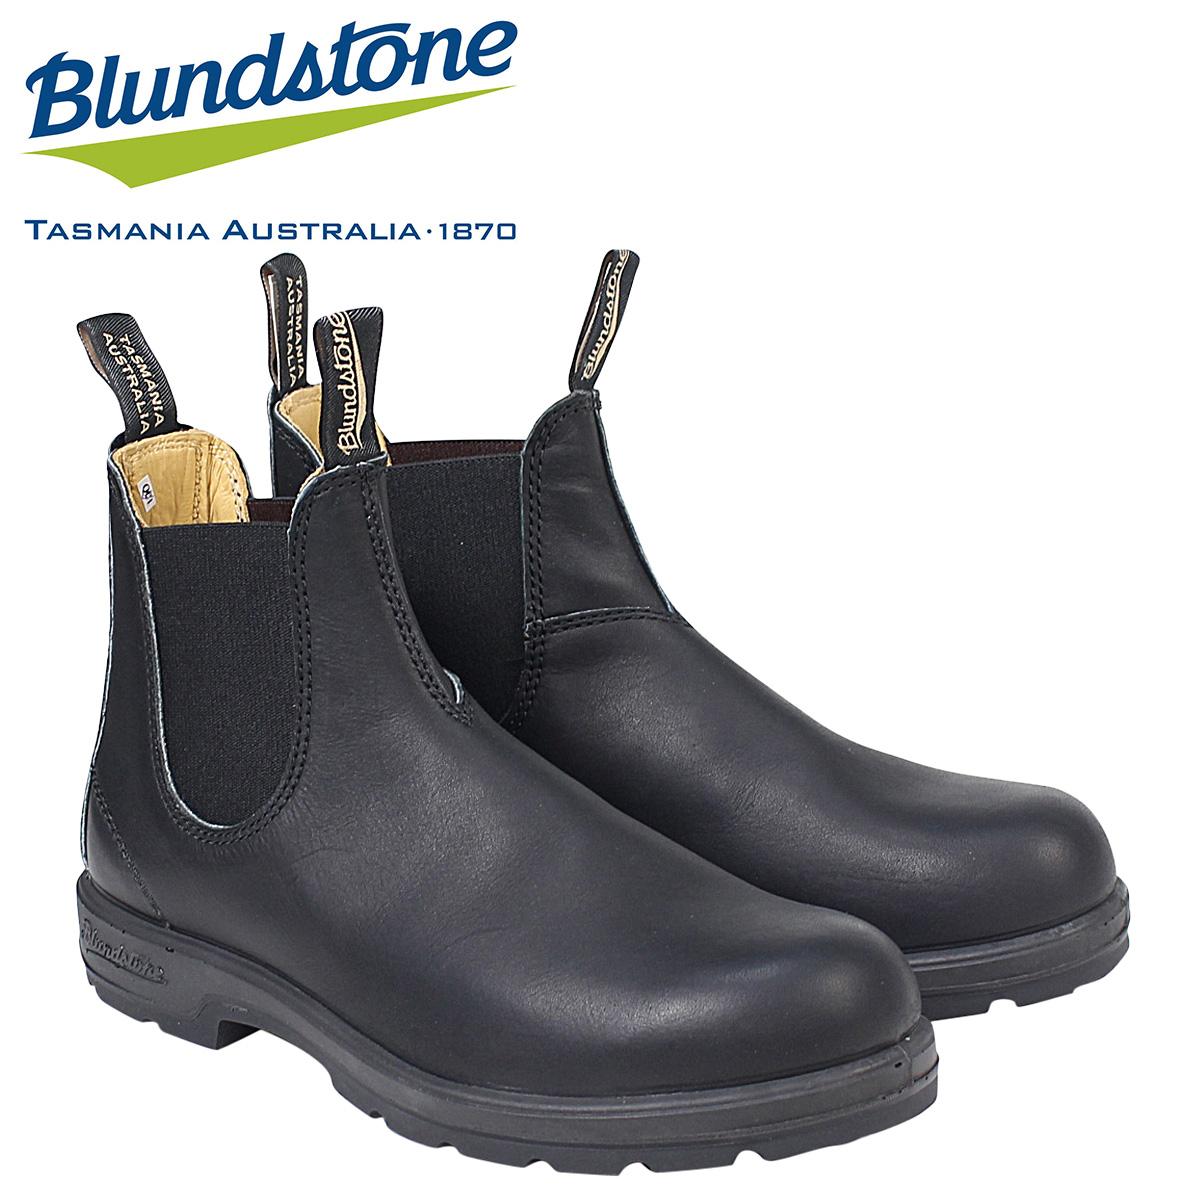 Blundstone ブランドストーン サイドゴア メンズ 558 ブーツ DRESS V CUT BOOTS ブラック 黒